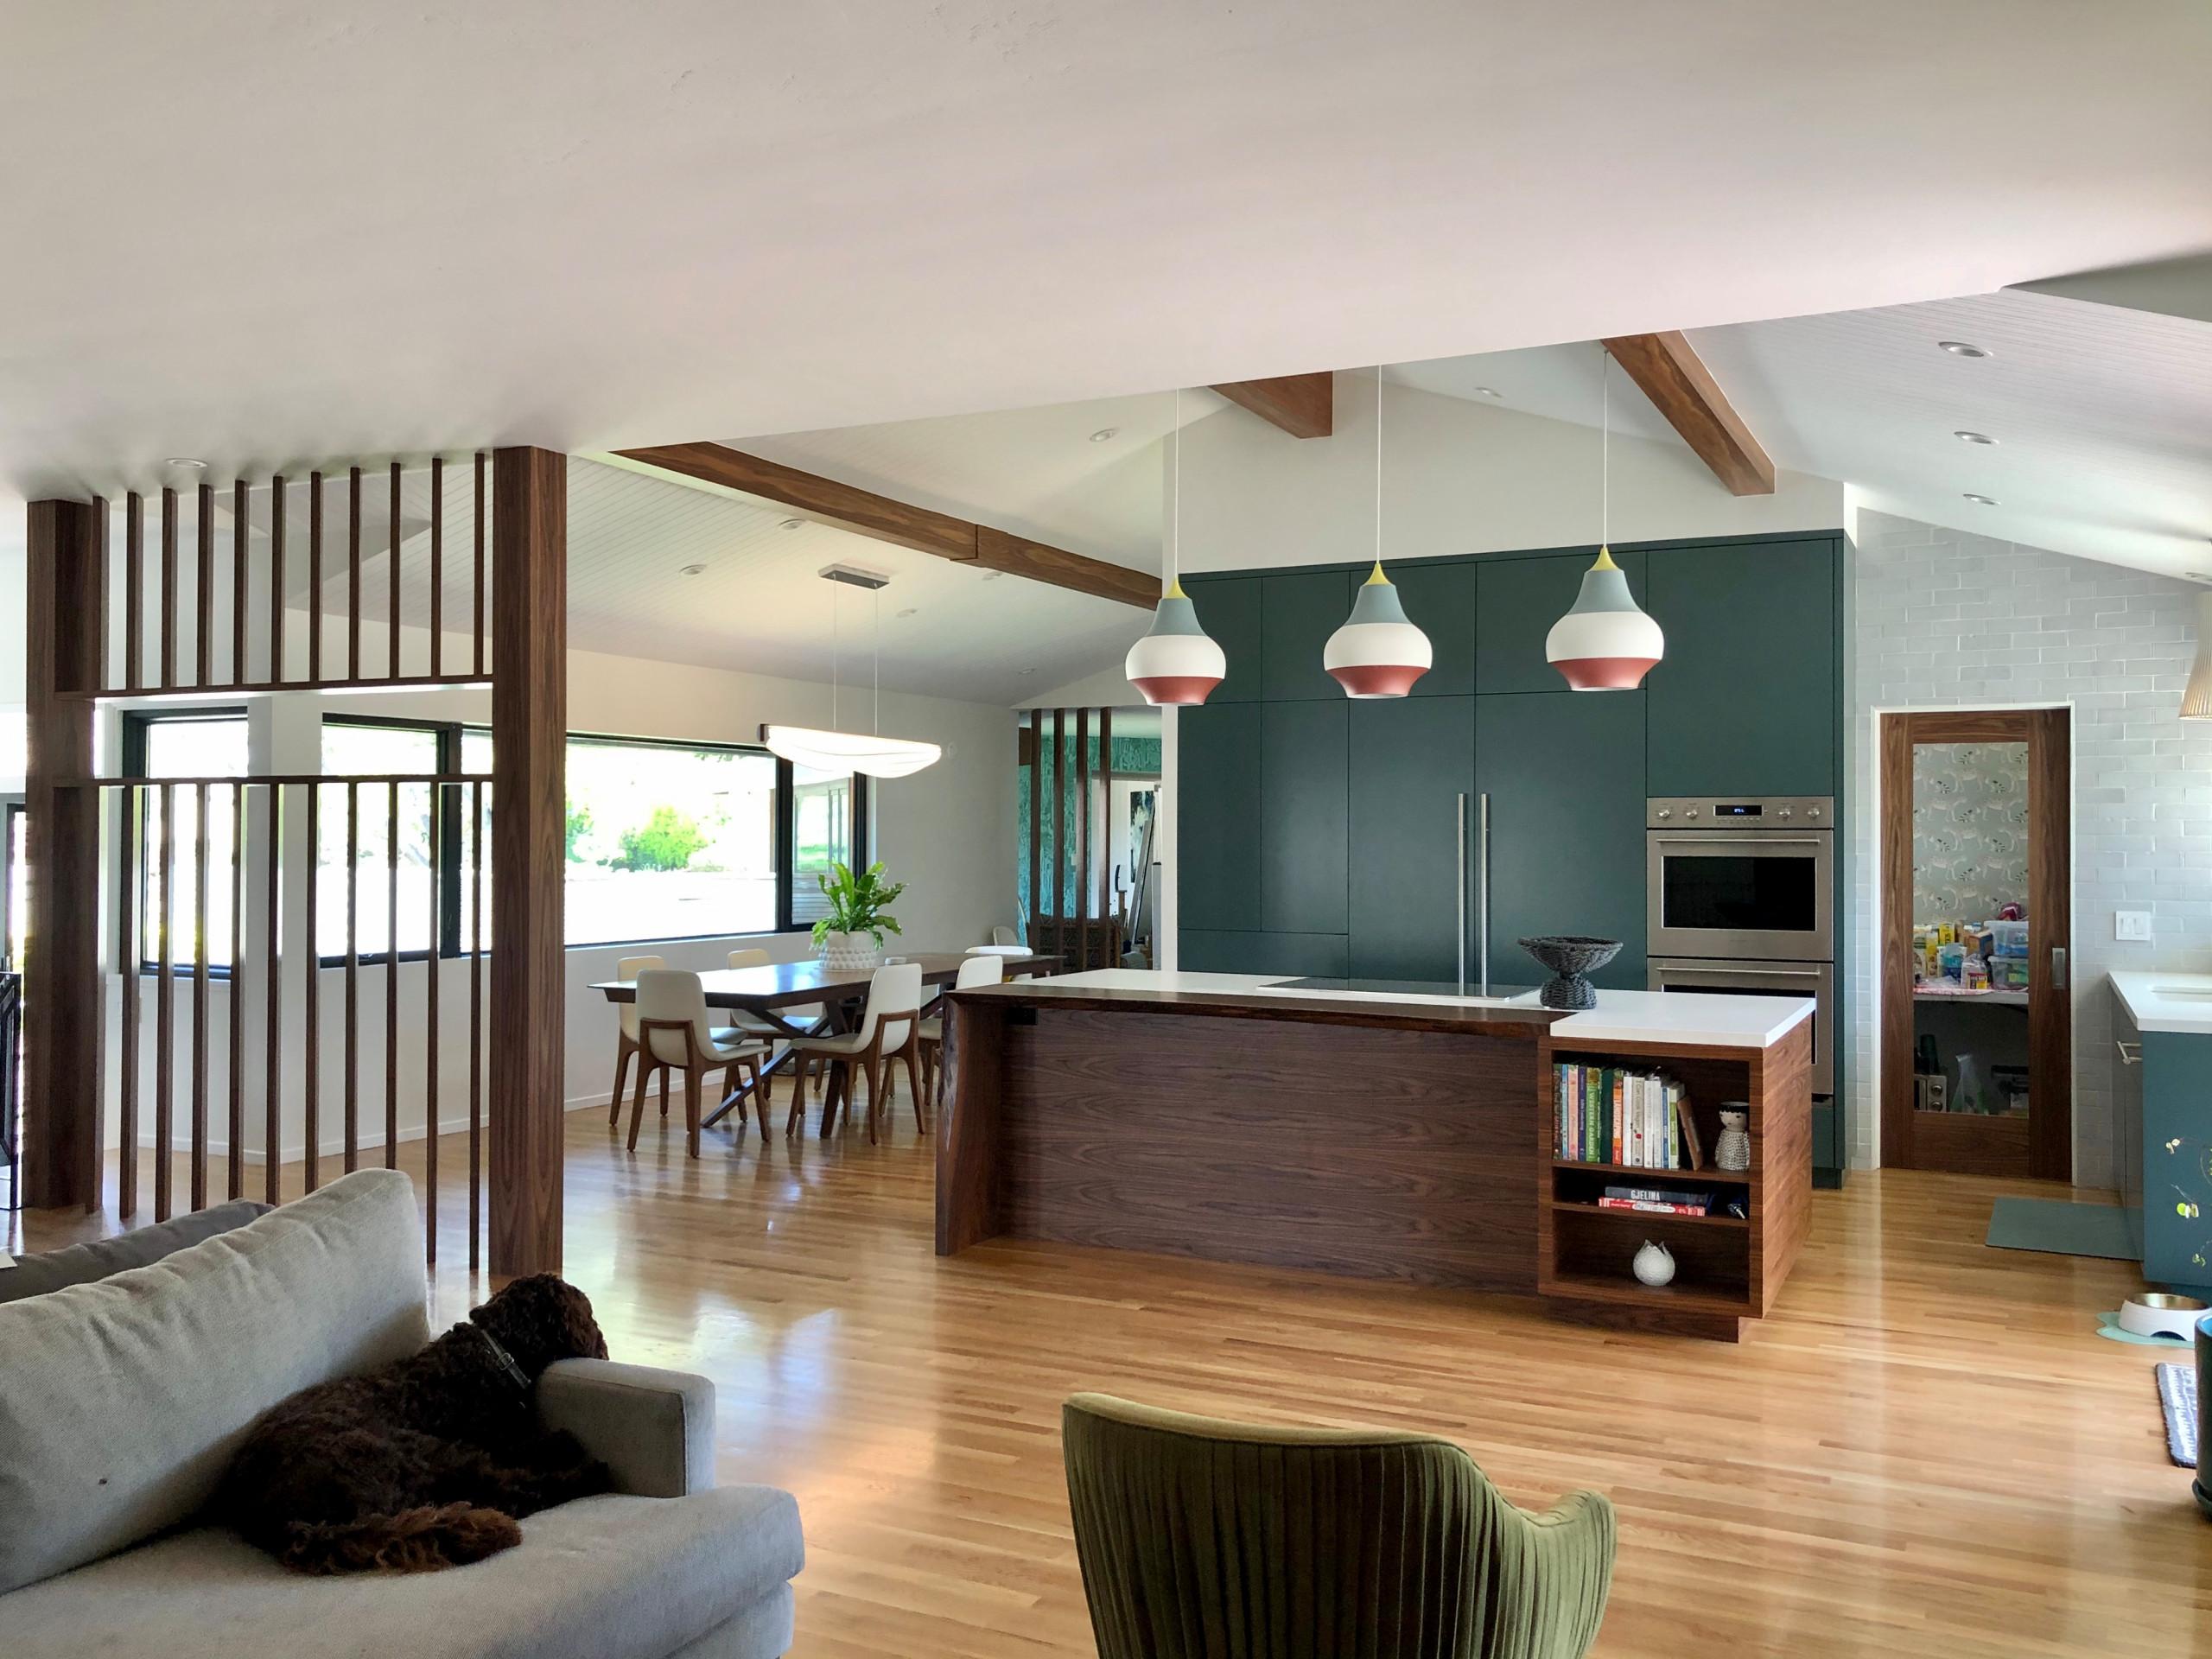 75 Beautiful Mid Century Modern Kitchen Pictures Ideas July 2021 Houzz